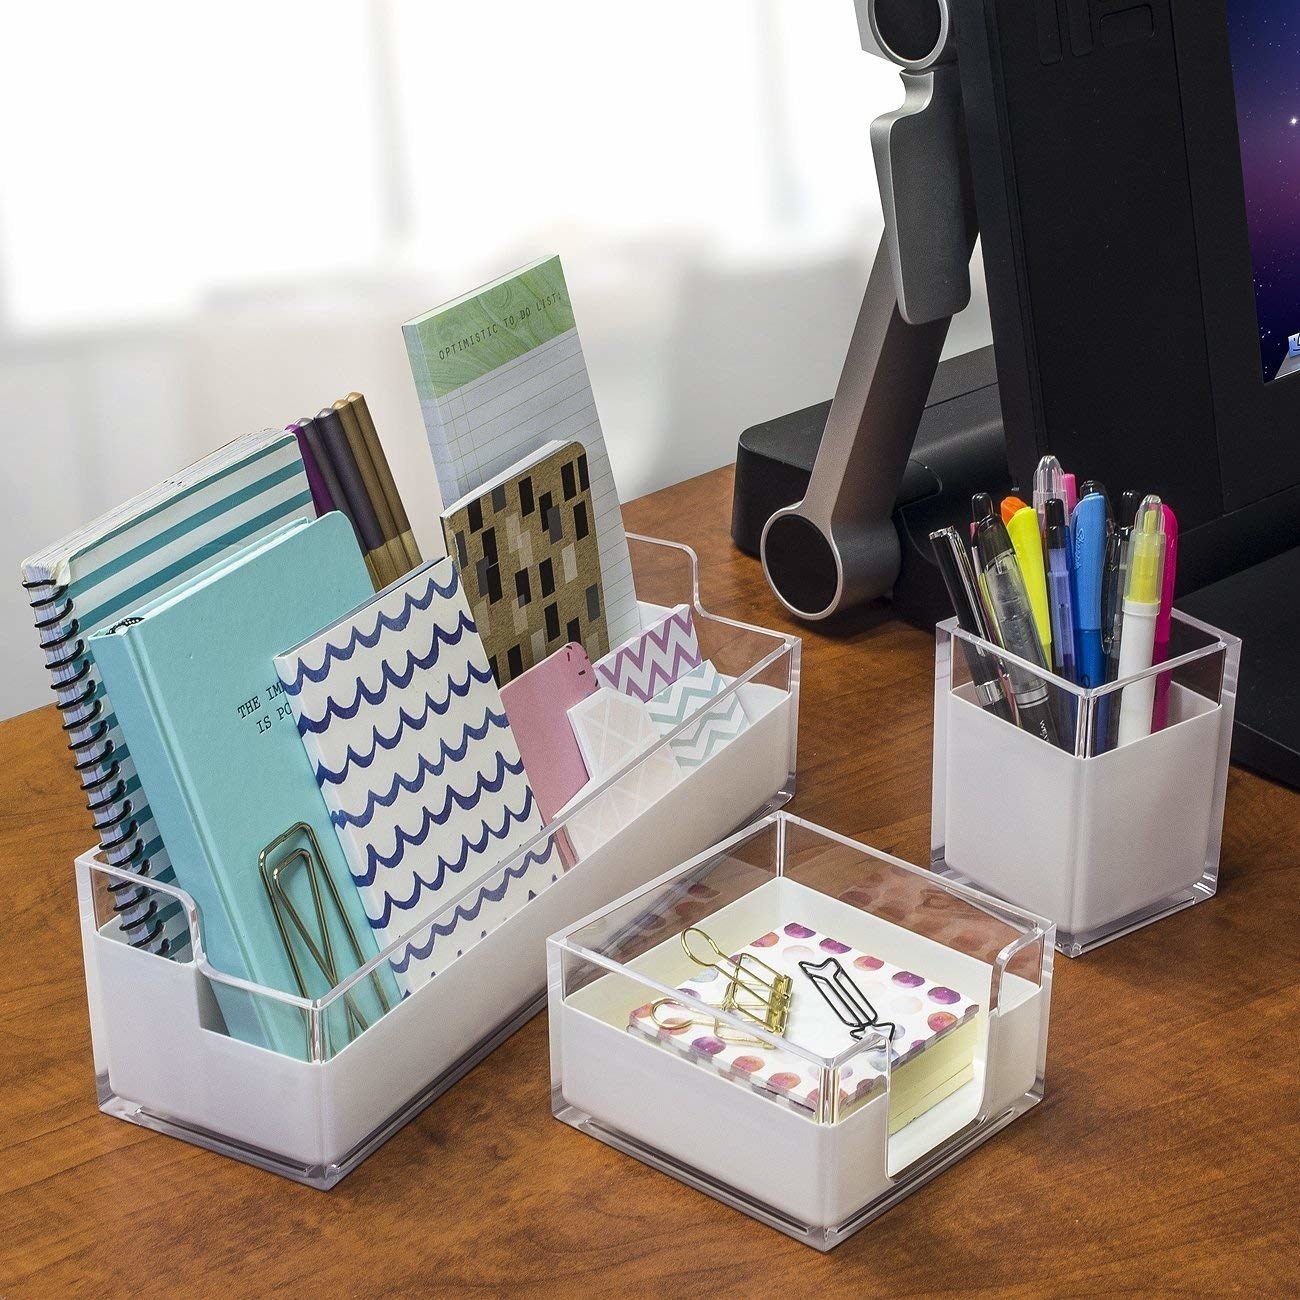 Acrylic organizers on desk